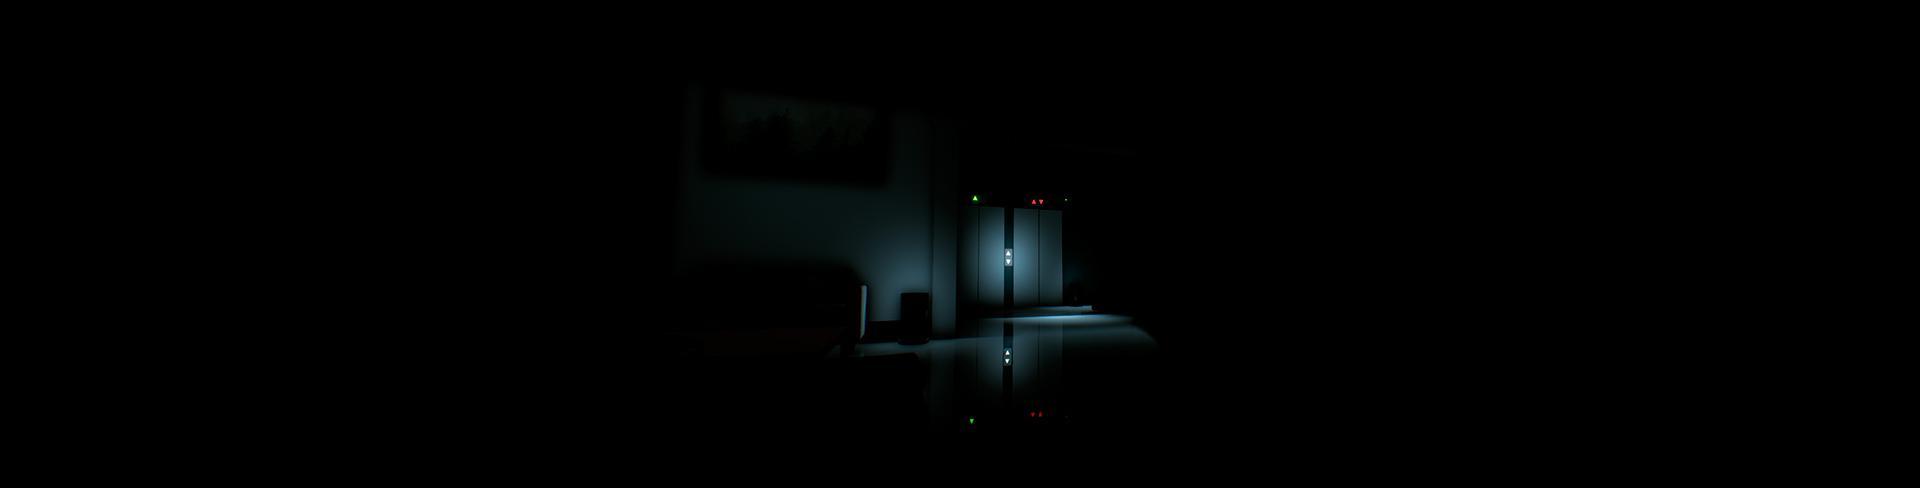 Where's The Fck*ng Light